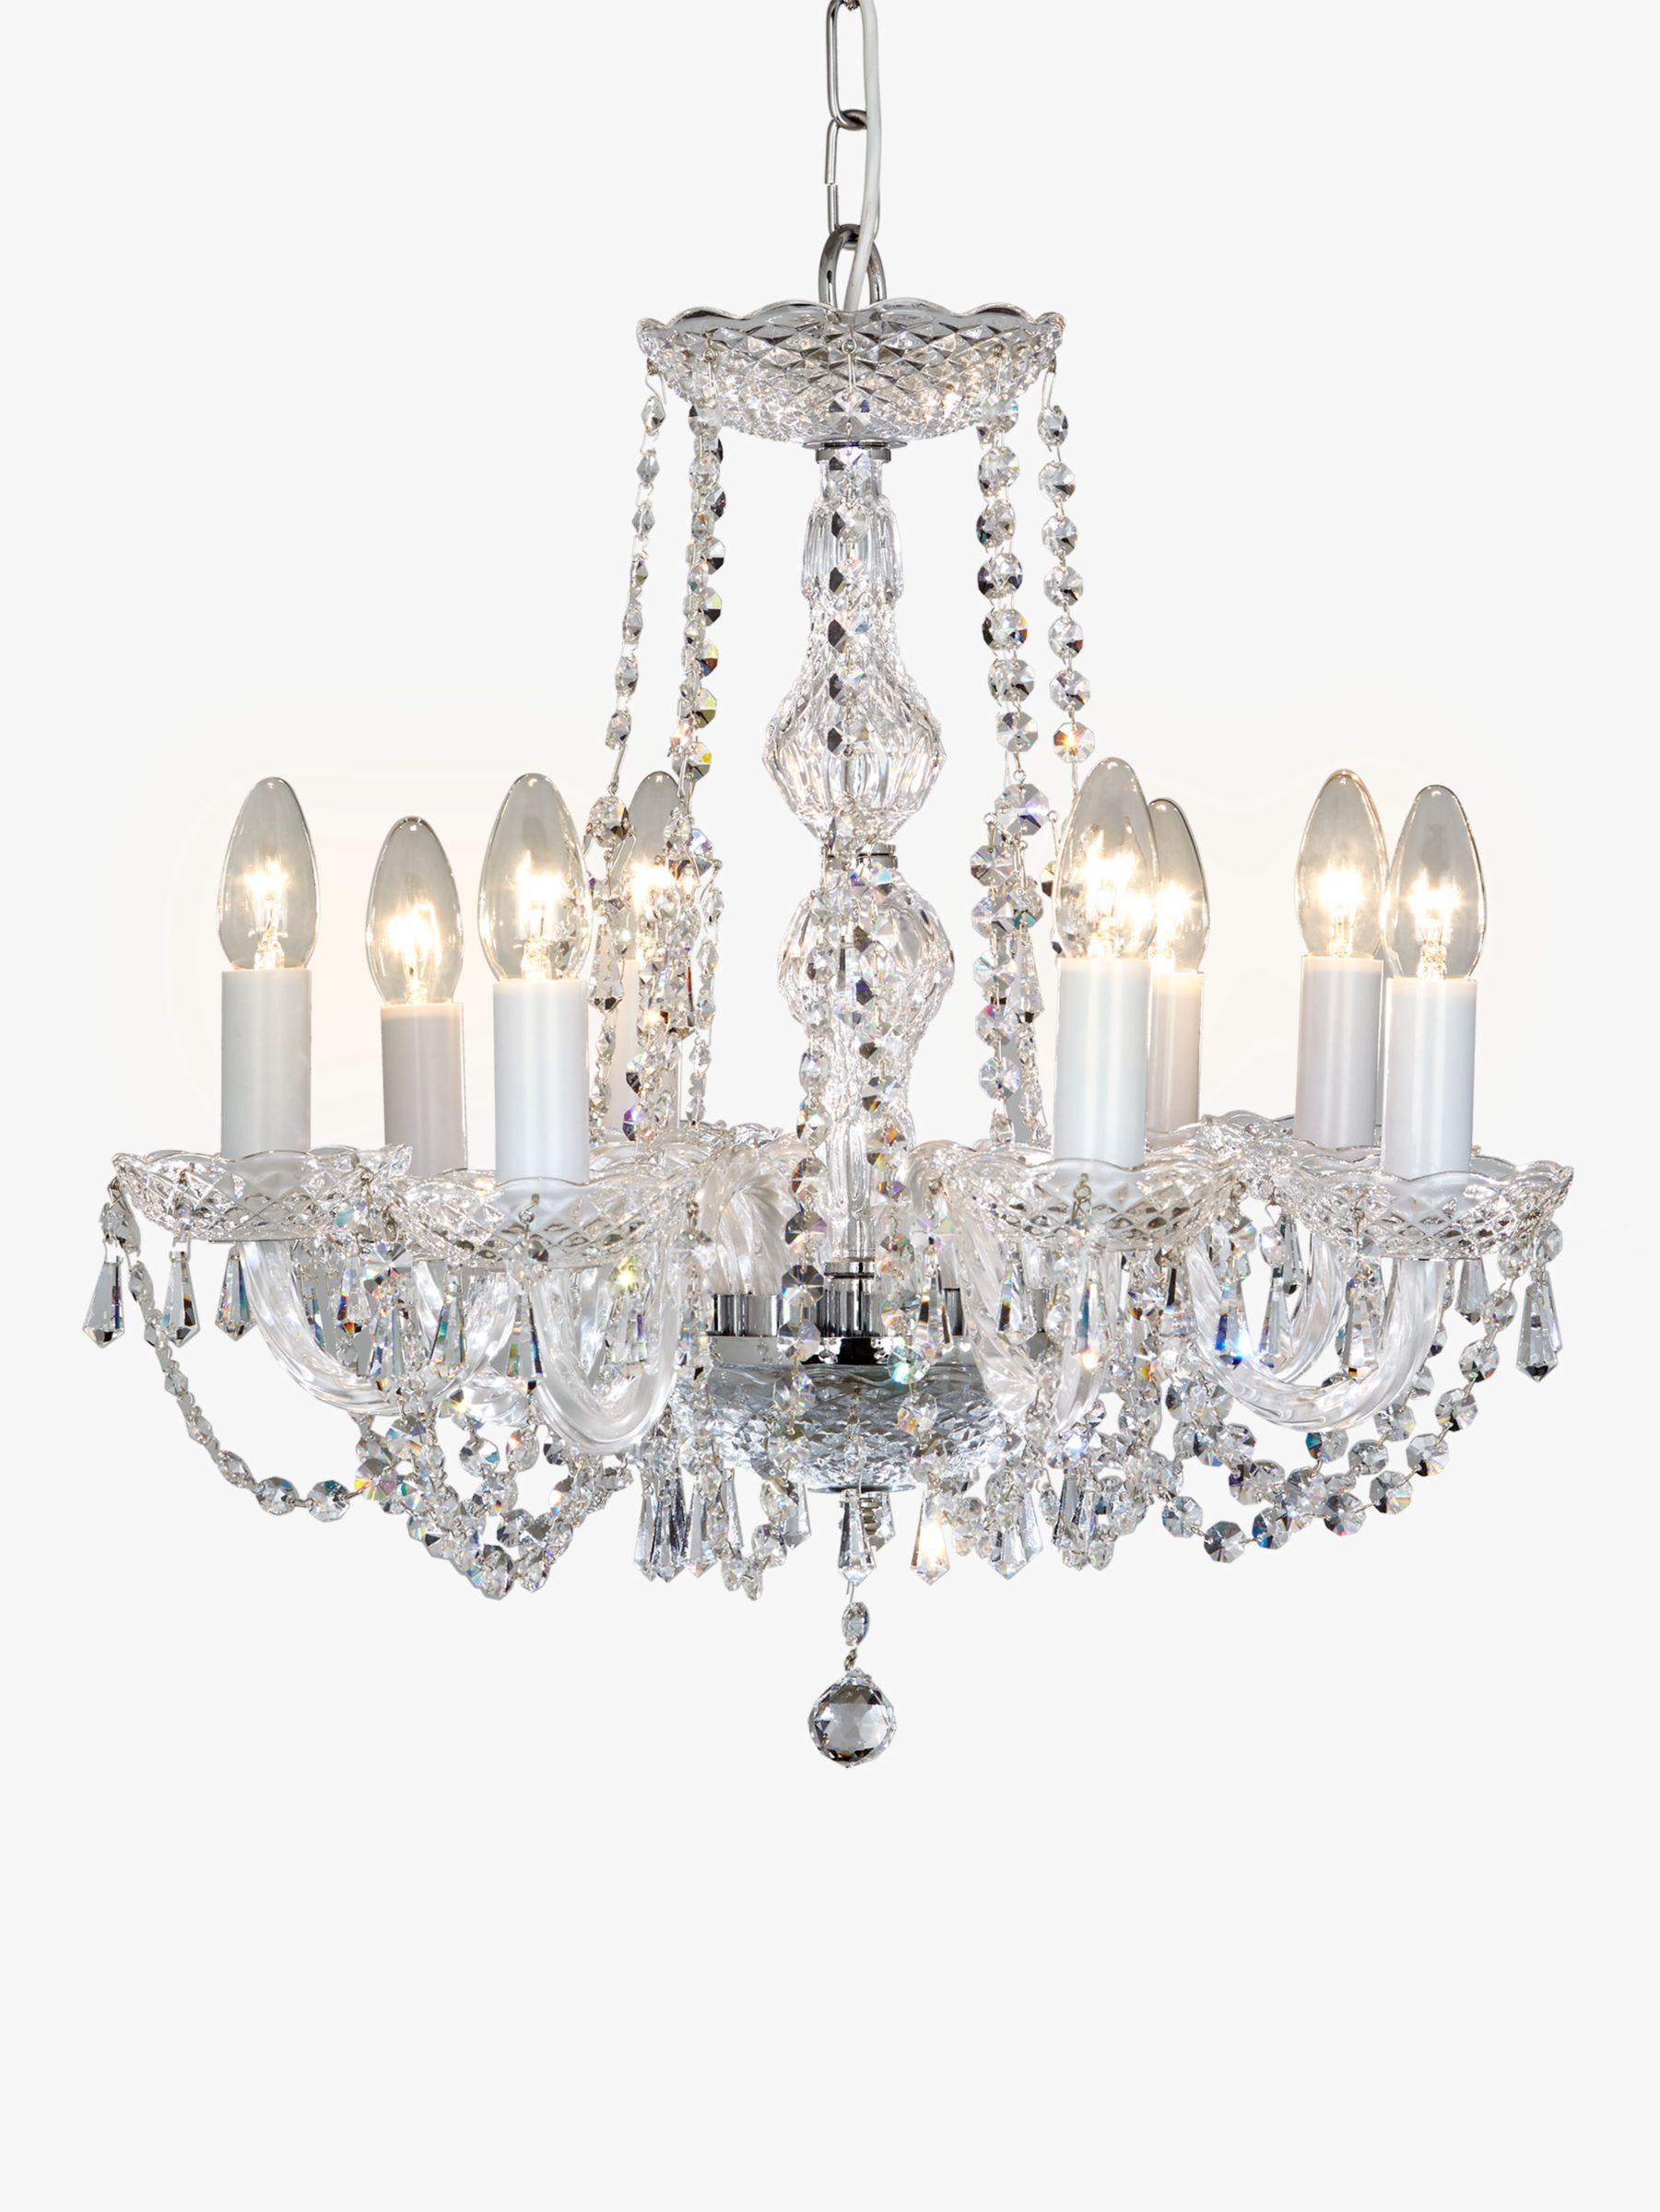 adfc chandelier clear dsc mega lights products pop glass